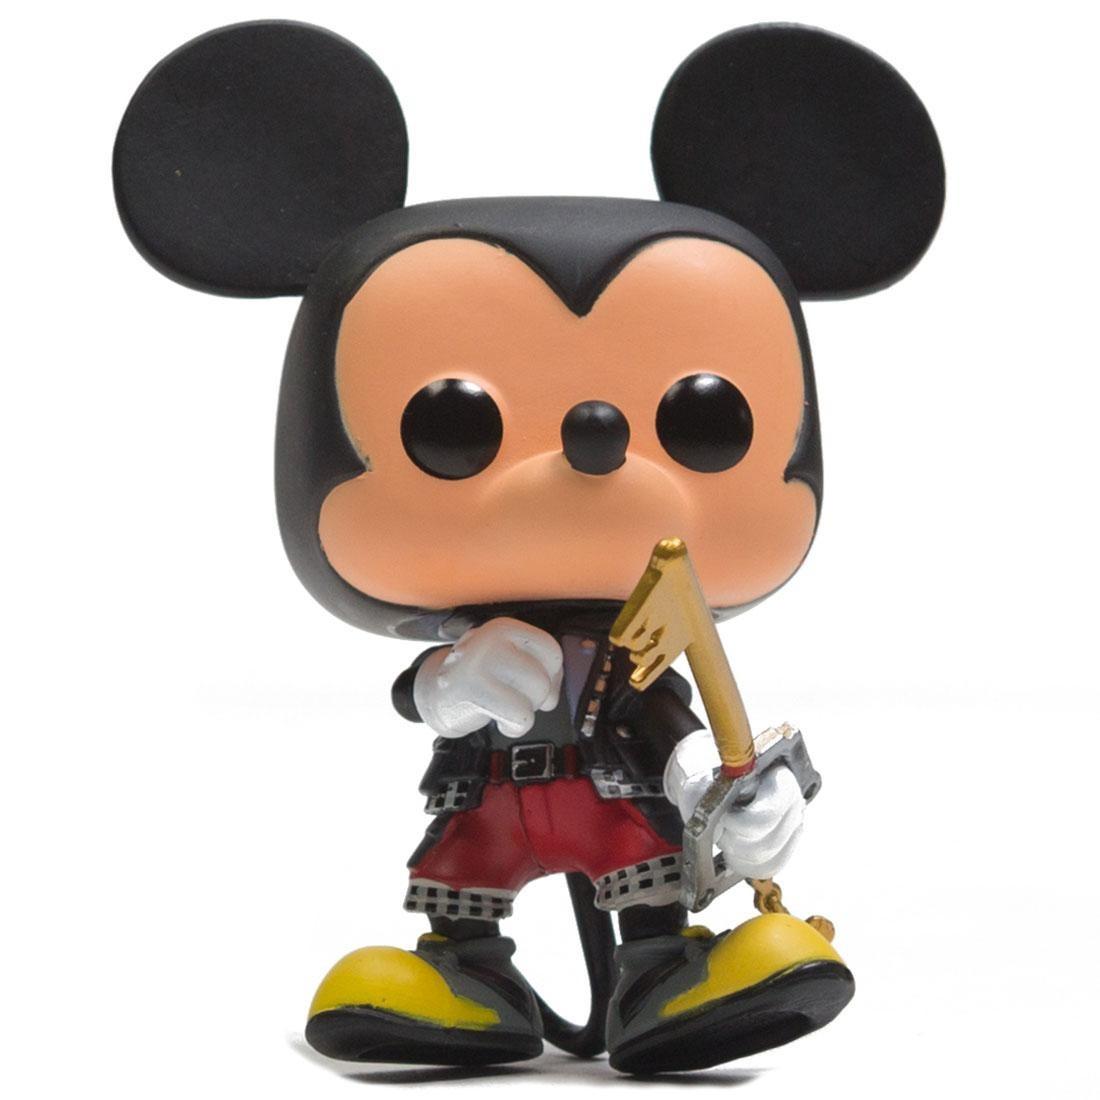 Funko POP Disney Kingdom Hearts 3 Mickey Figure (black)